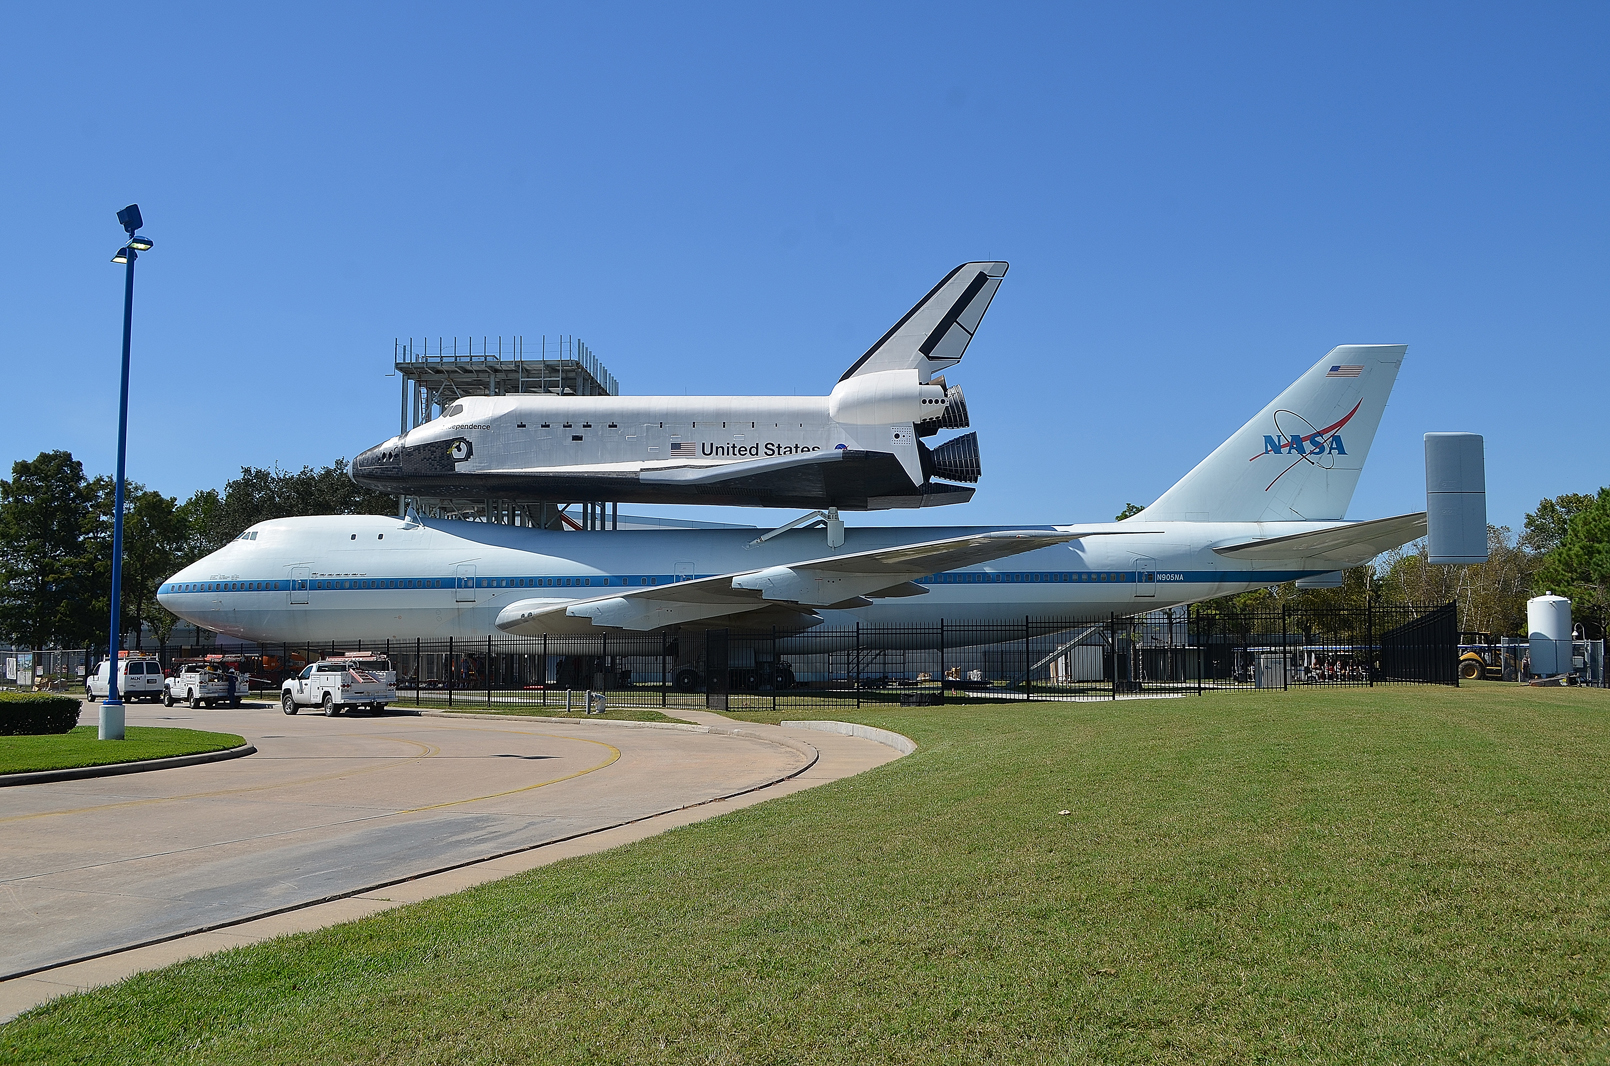 space shuttle landing in houston - photo #6